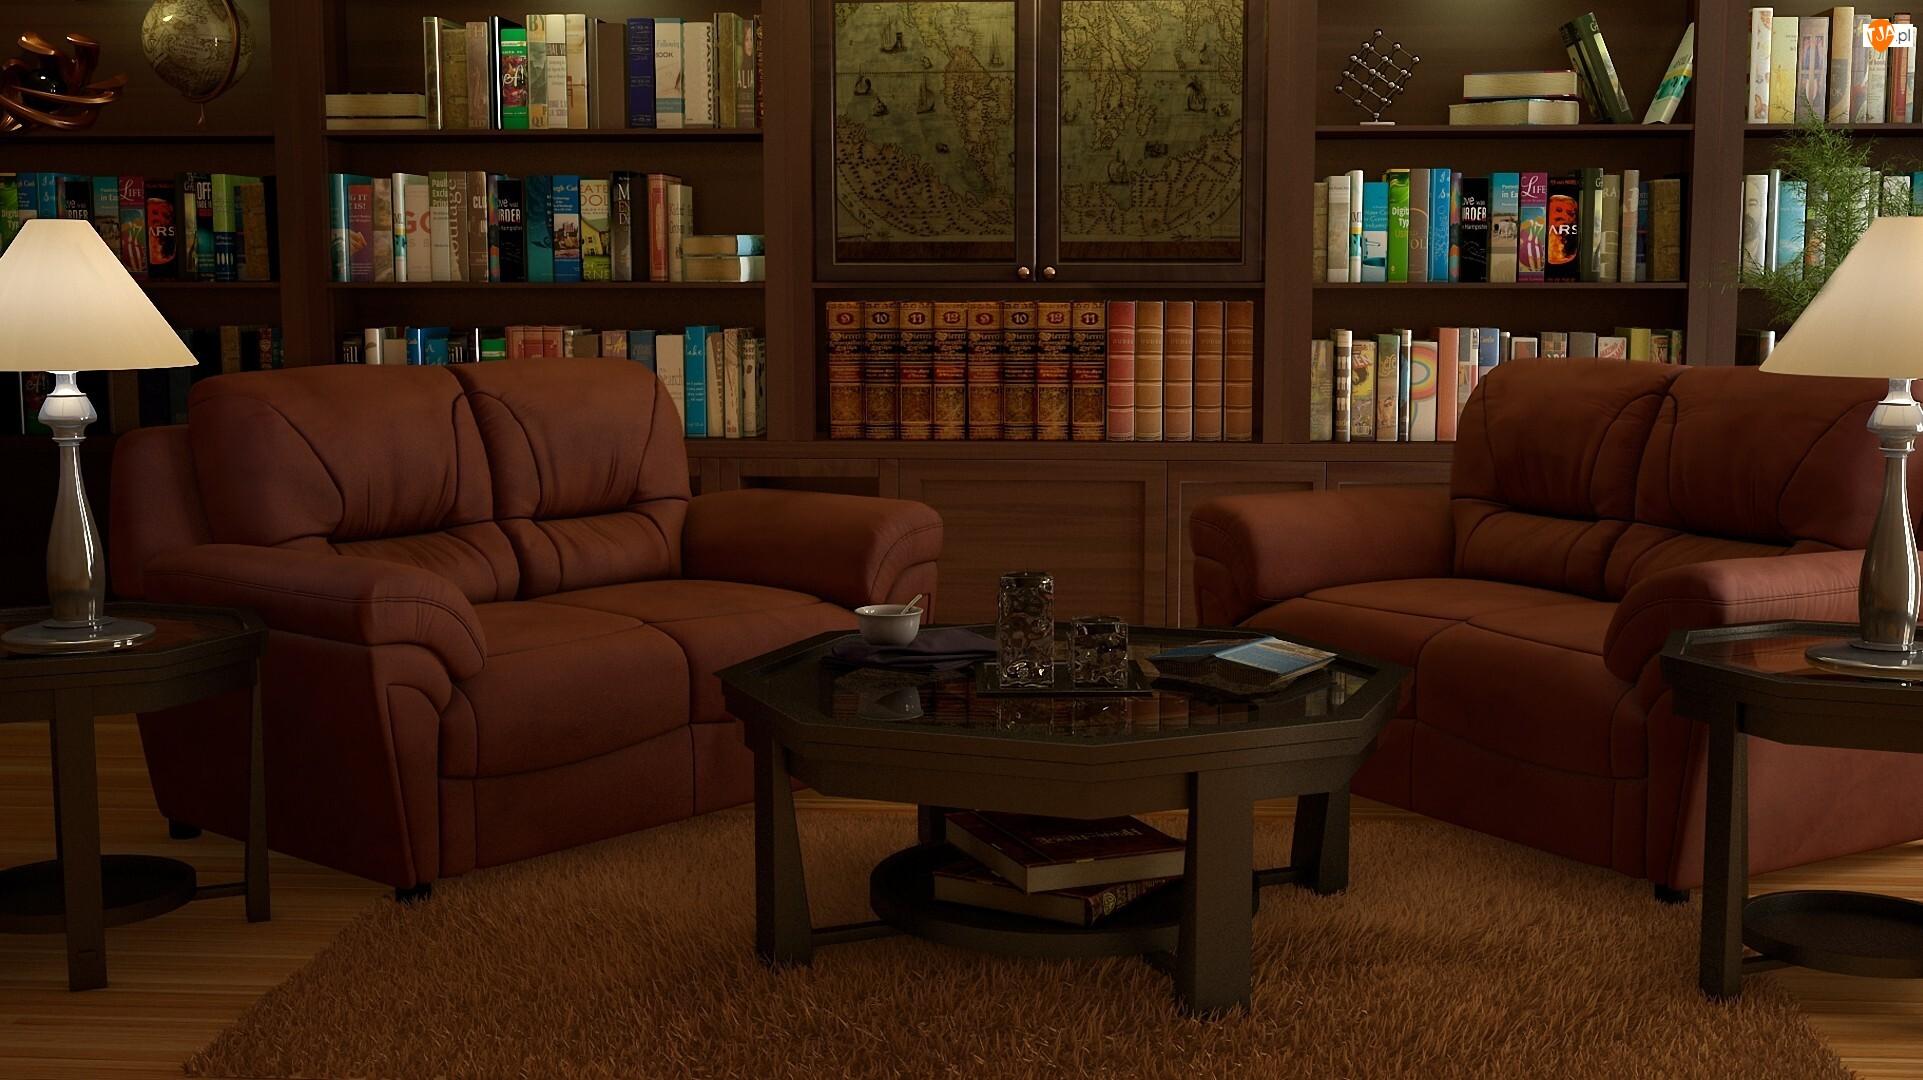 Regały, Pokój, Lampy, Stolik, Książki, Kanapy